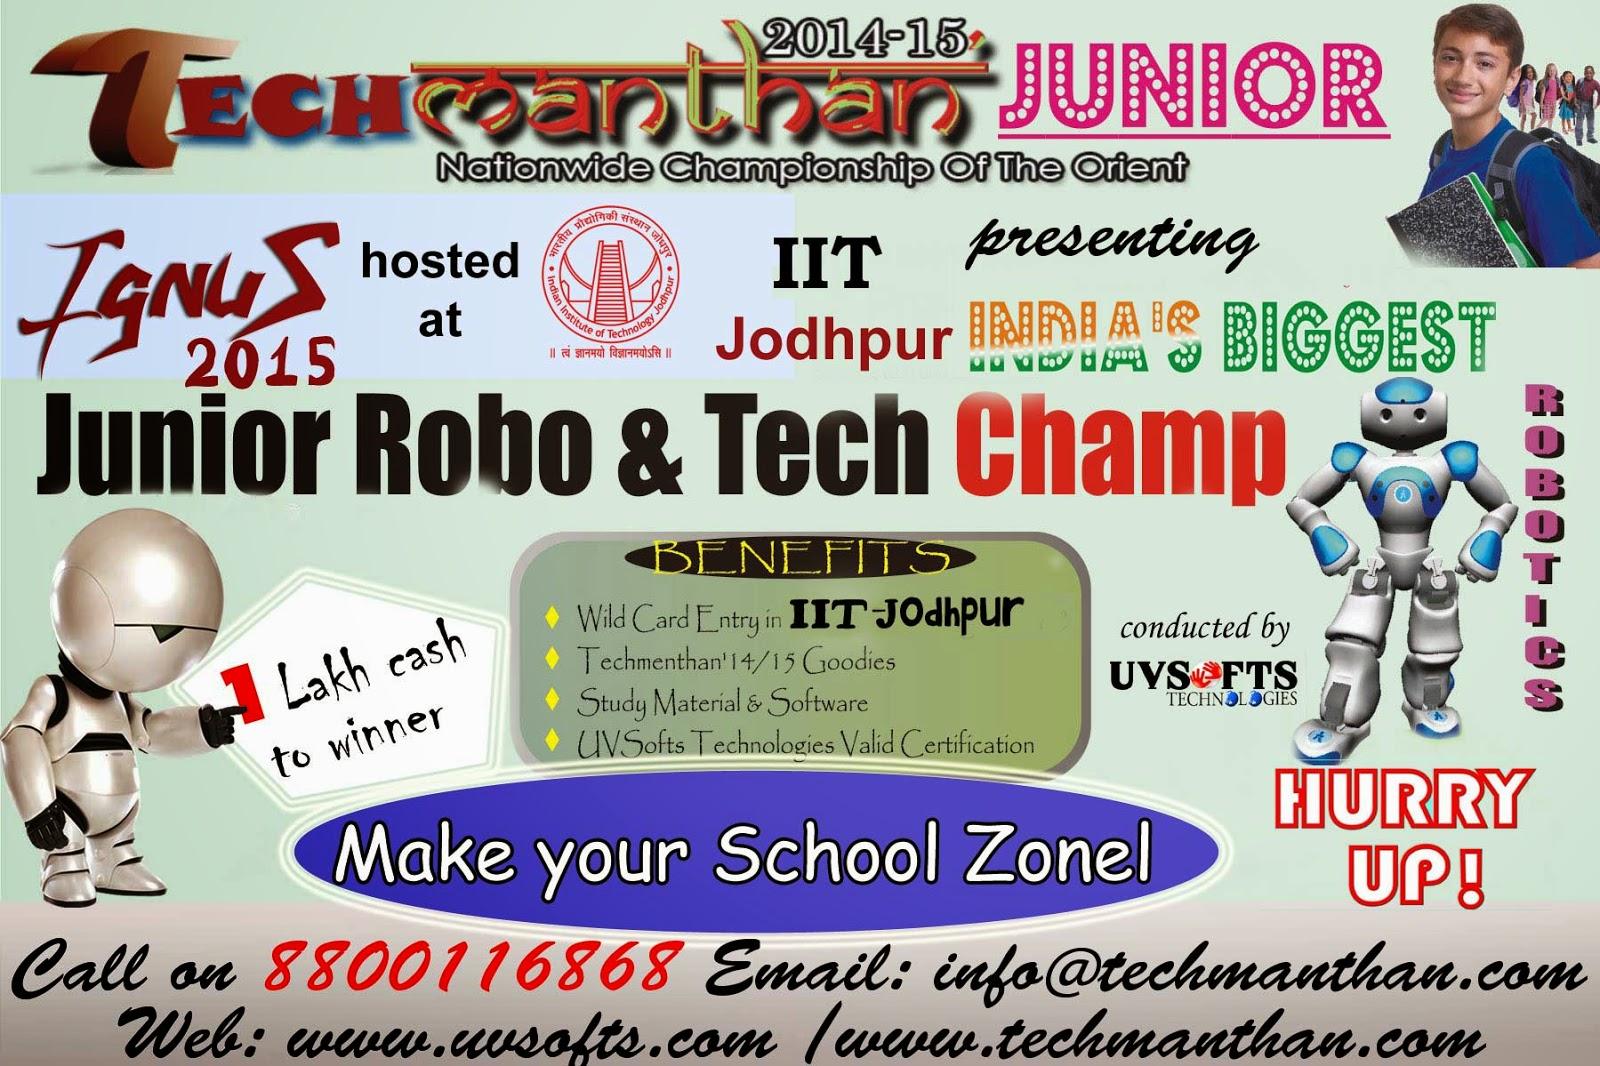 Uvsofts Technologies Ignus 15 Hosted At Iit Jodhpur Presenting A